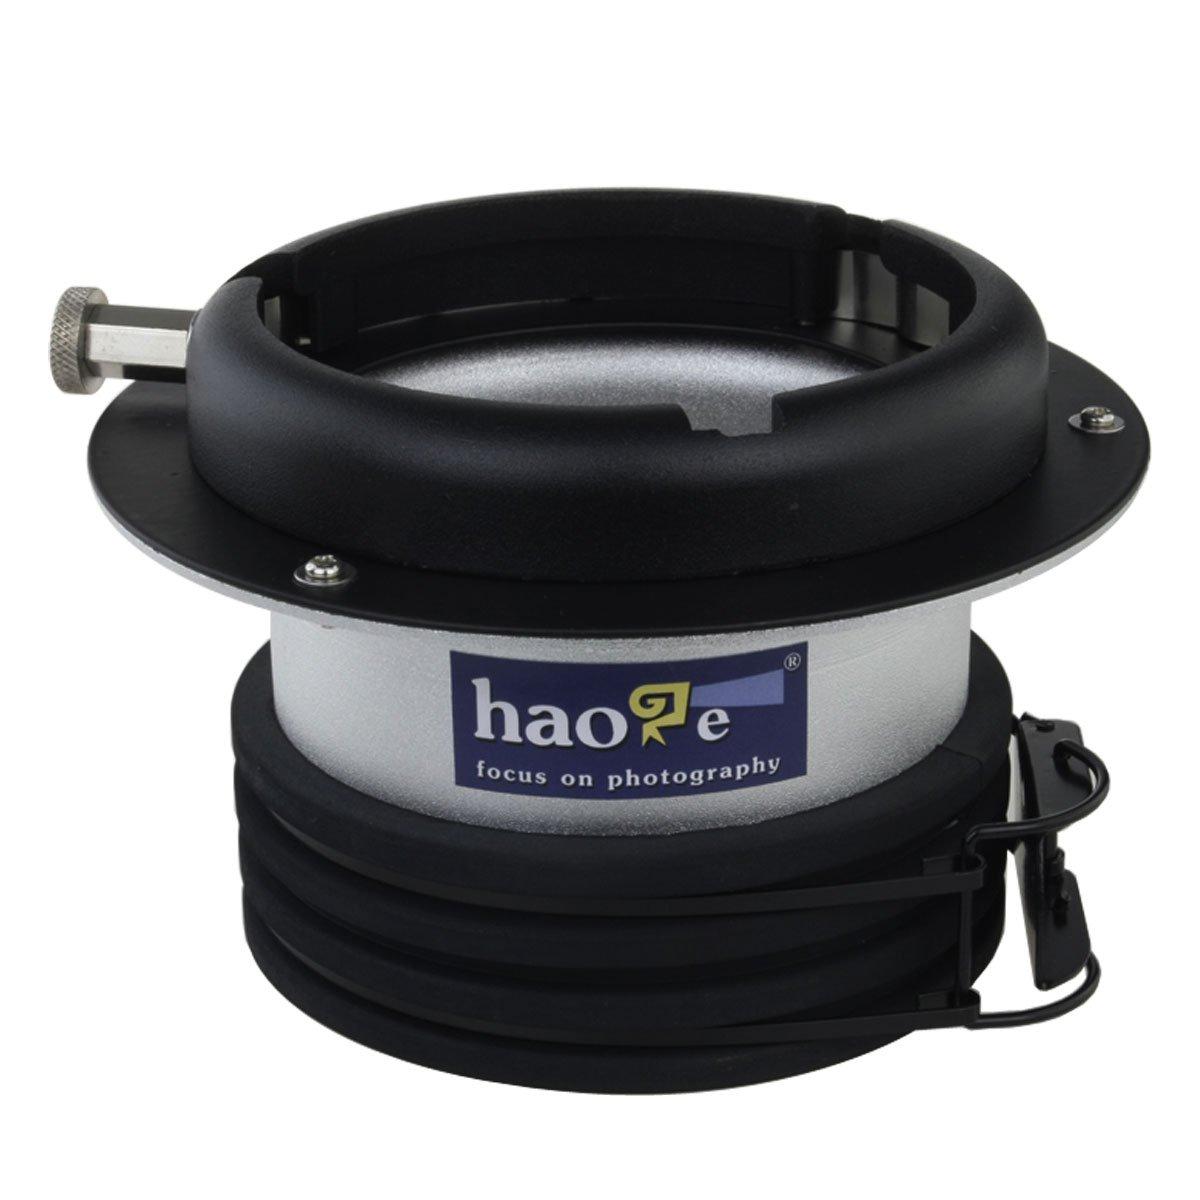 Haoge Profoto to Bowens Mount Speedring Ring Adapter Converter for Studio Light Strobe Flash AD-P2B